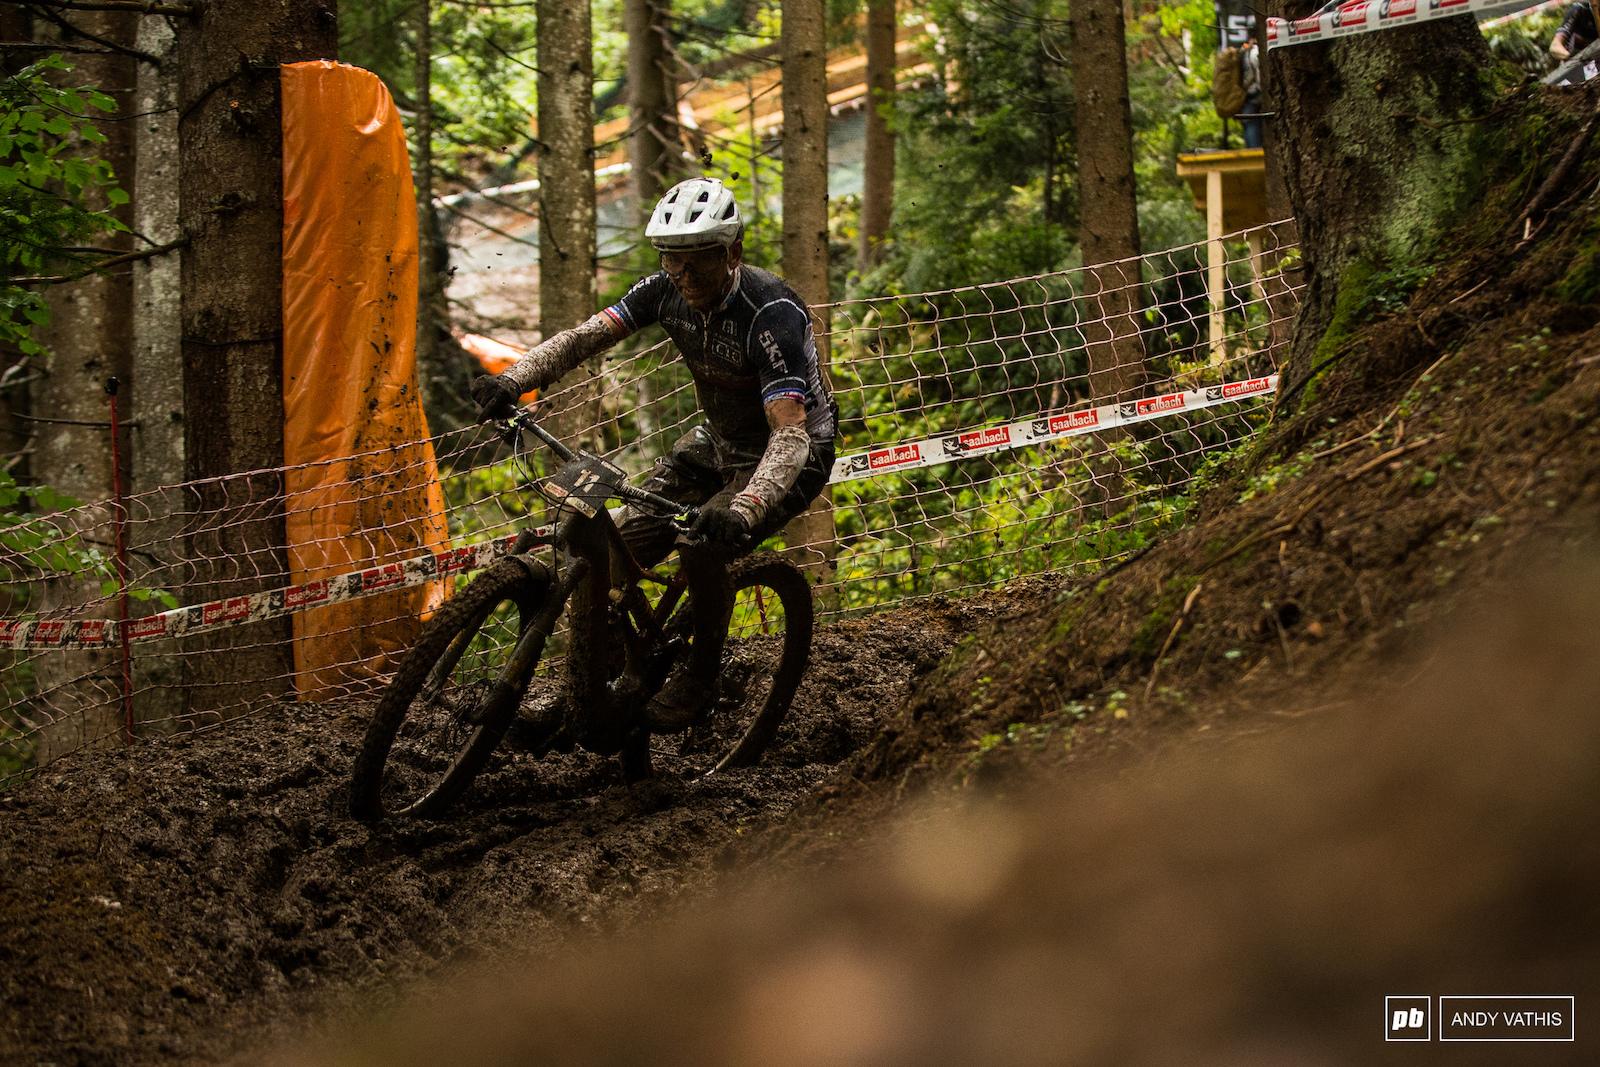 Jean Pierre Bruni enjoying the ruts.